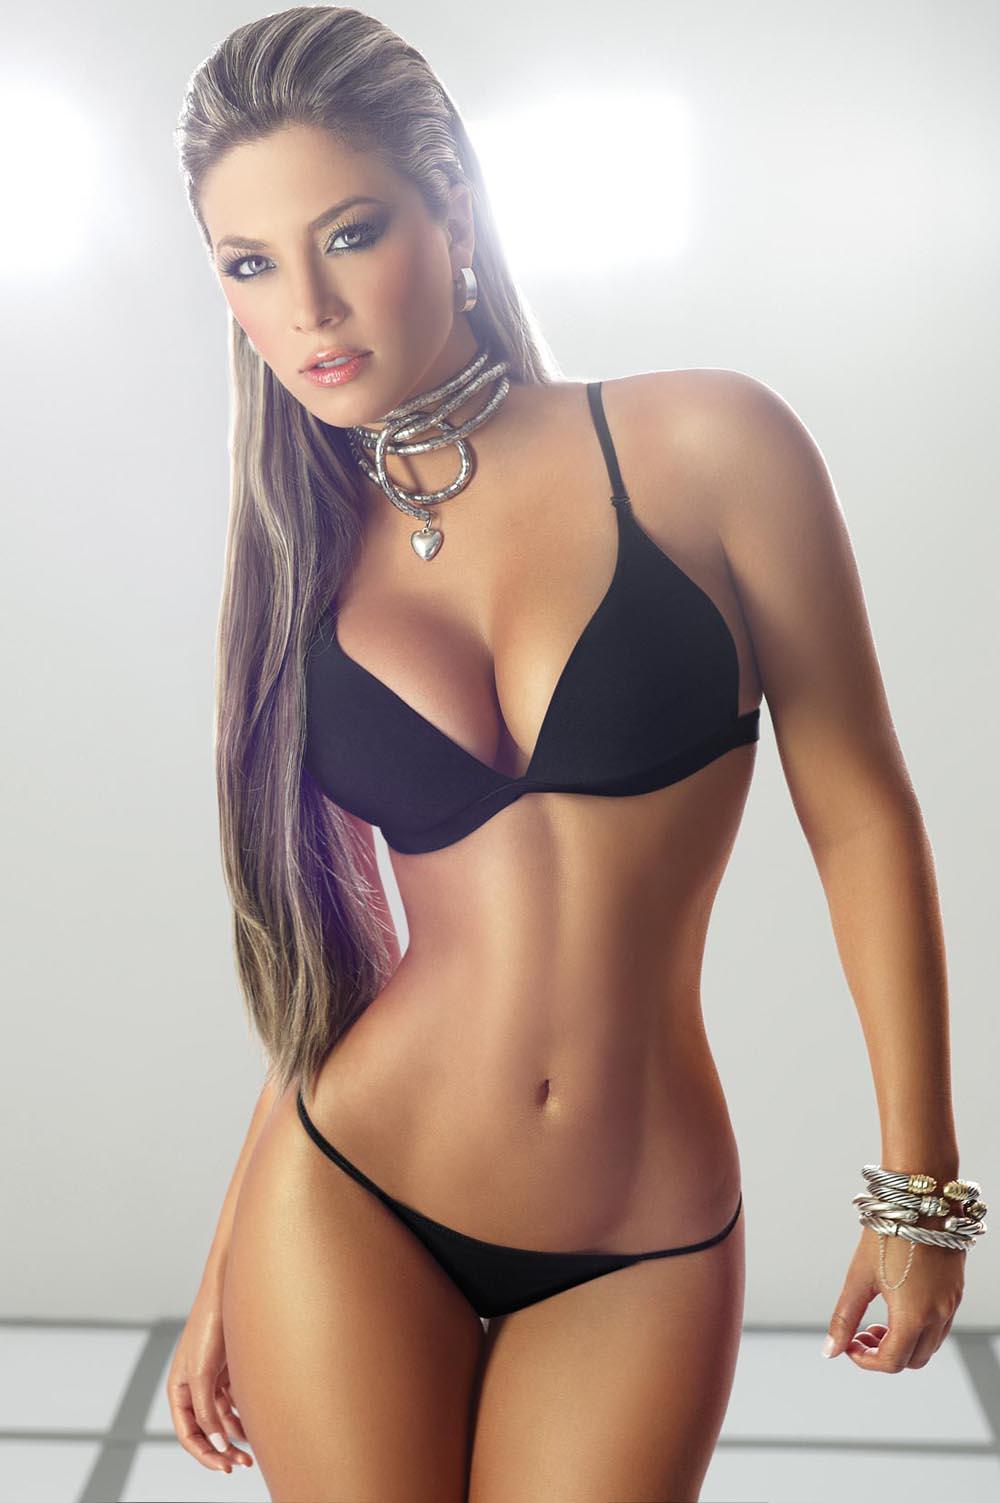 Hot Brunette Virtual Sex